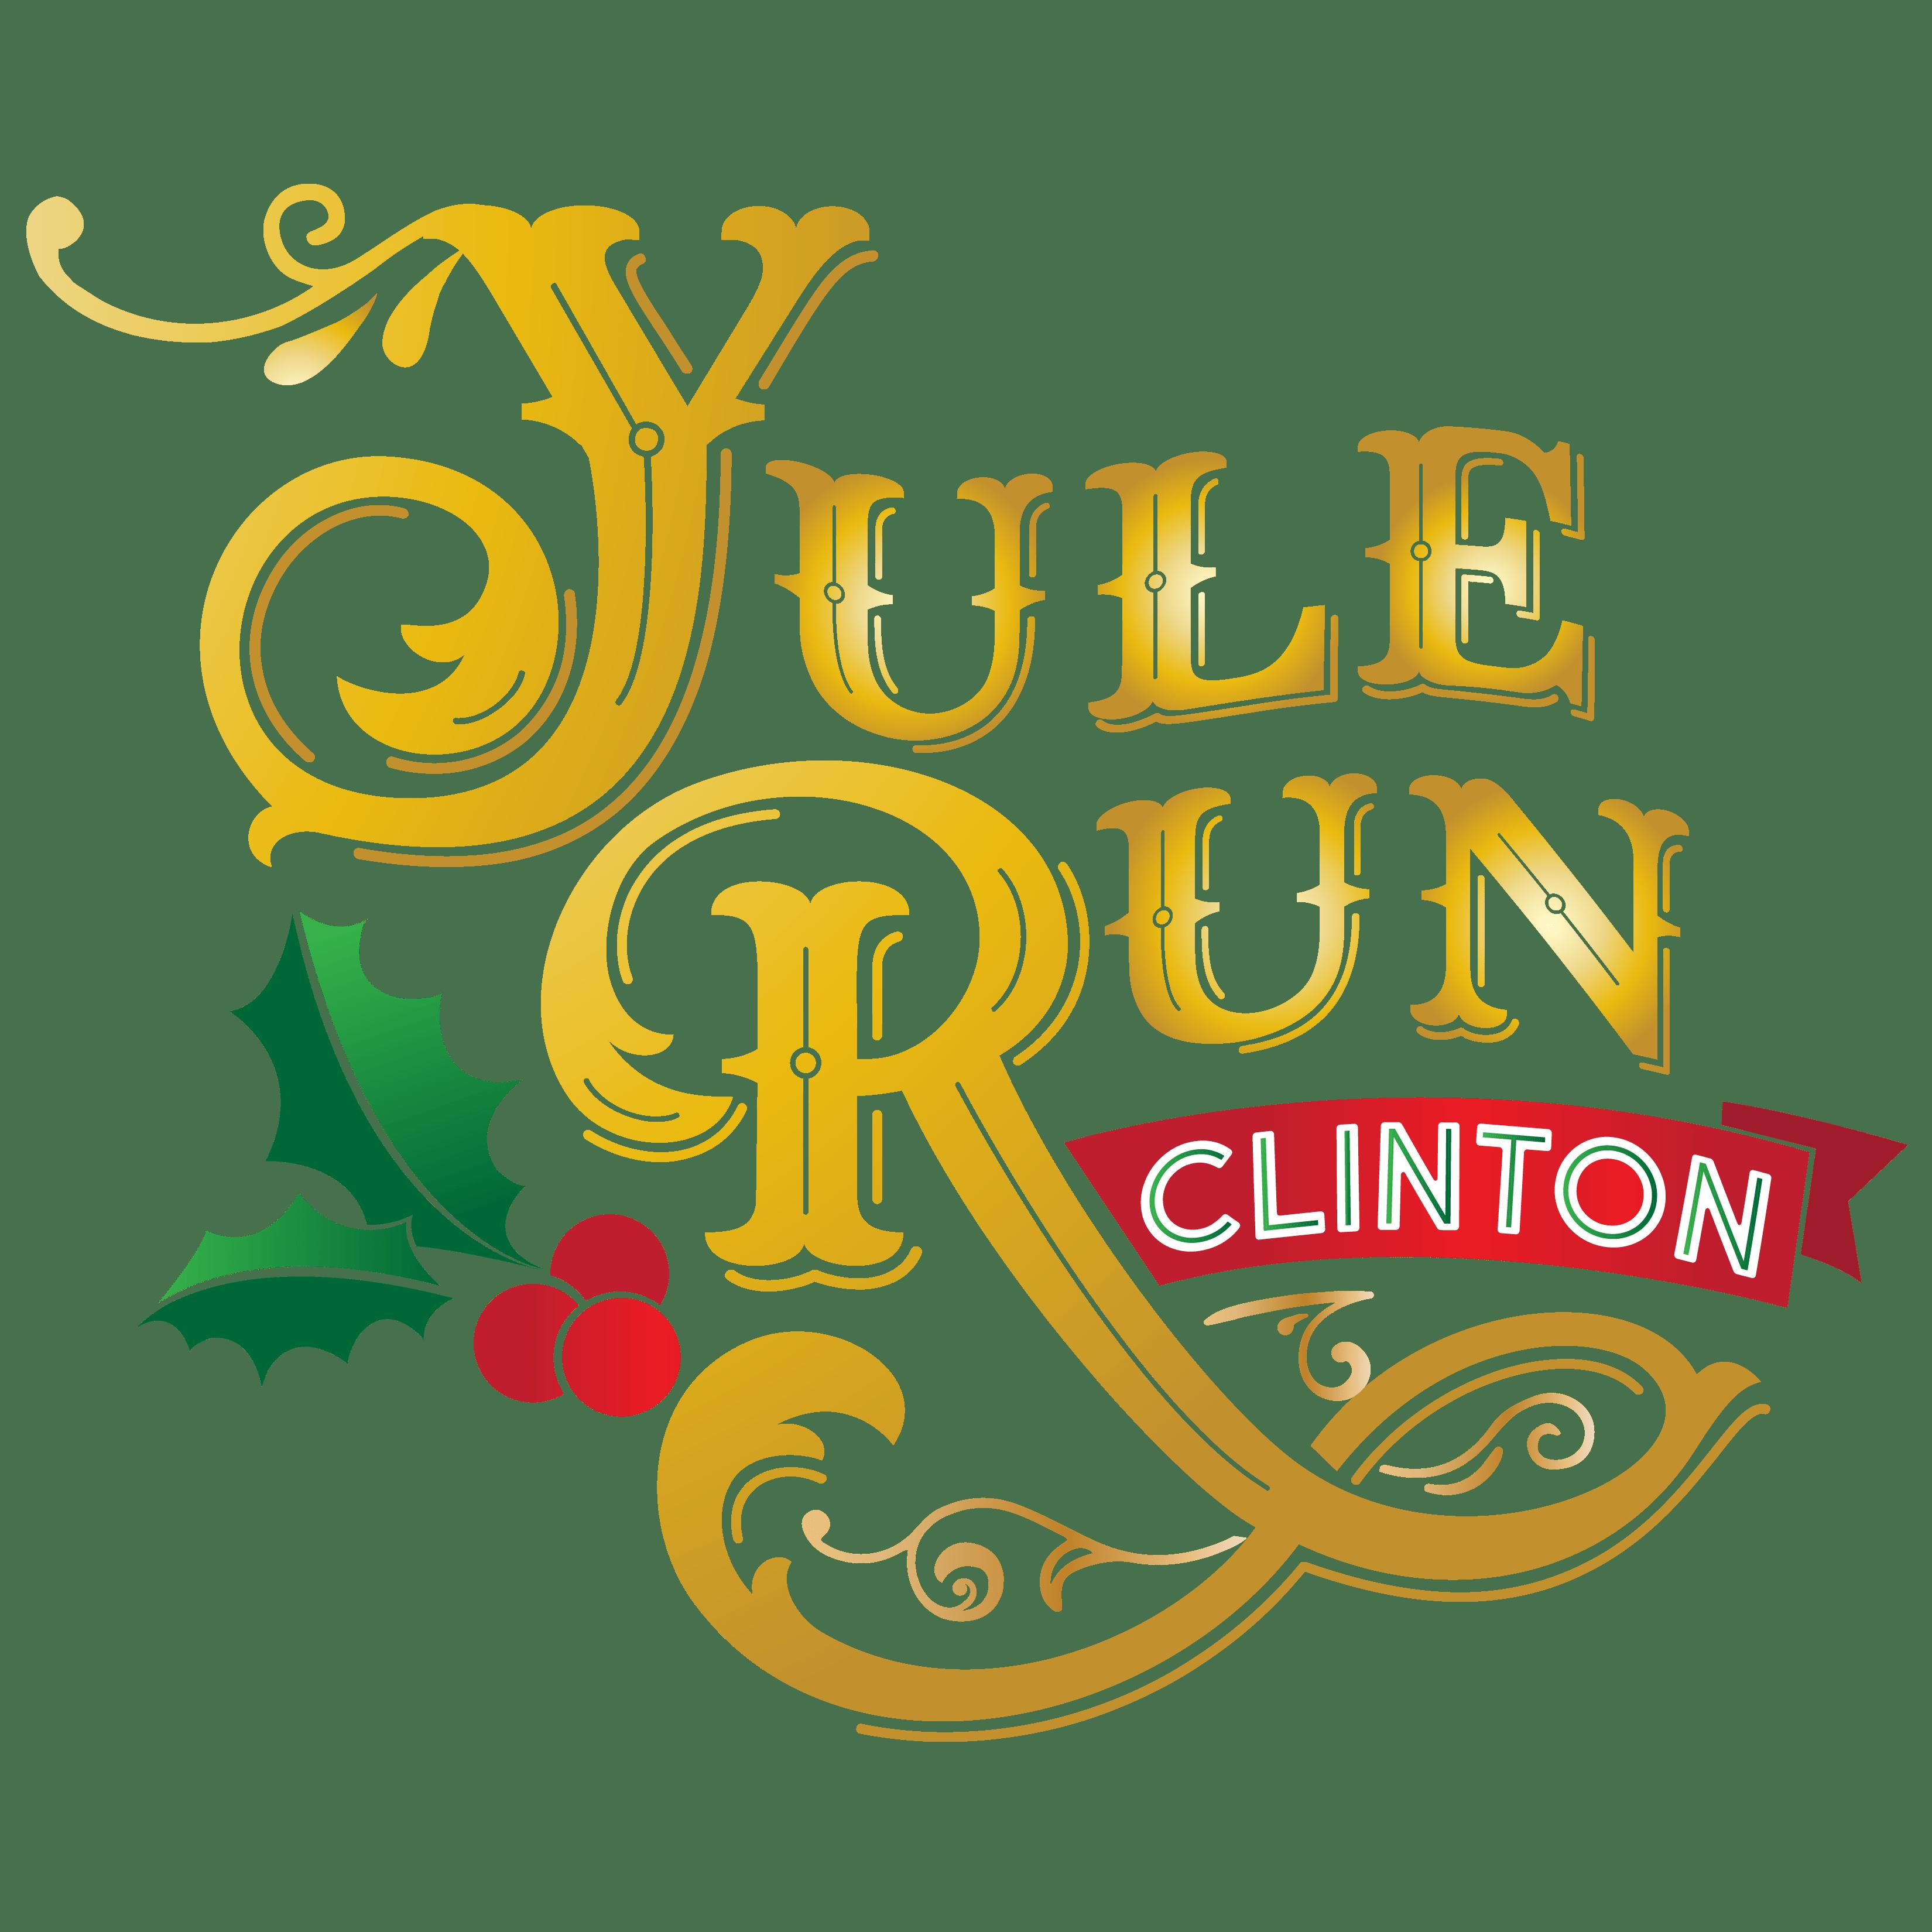 Yule Run Clinton logo